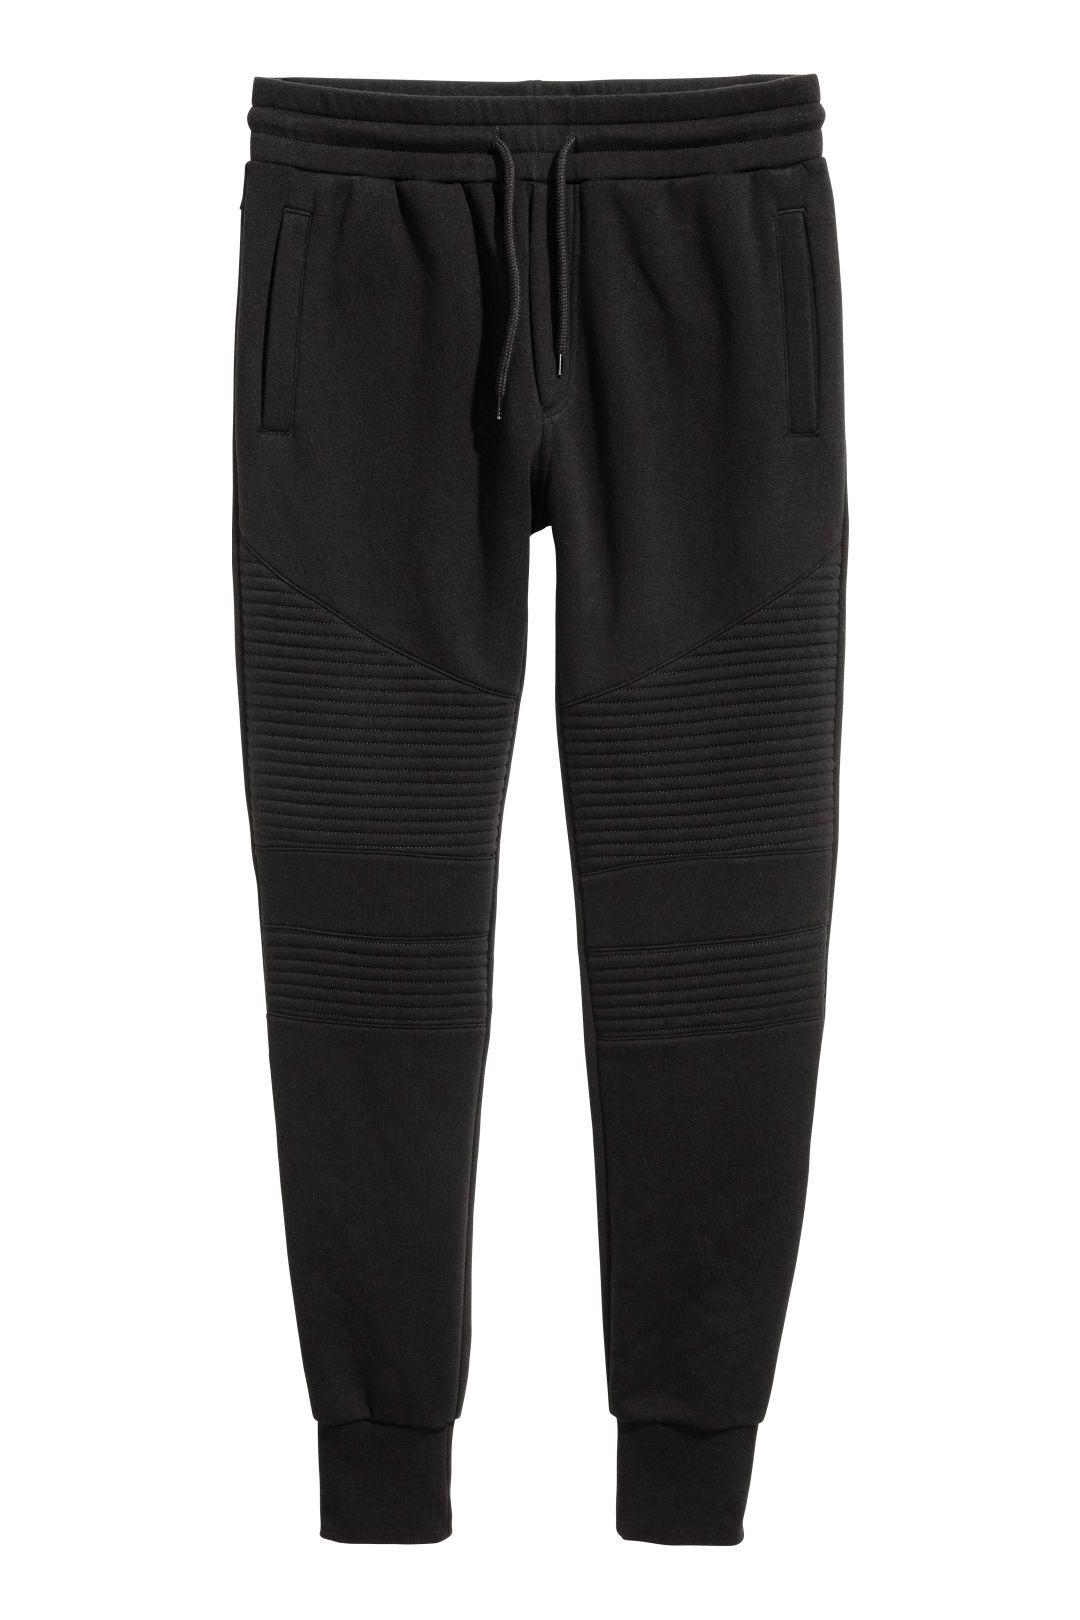 31981d400b9bc H&M Biker Joggers - Black | style | Pants, Mens joggers, Trousers